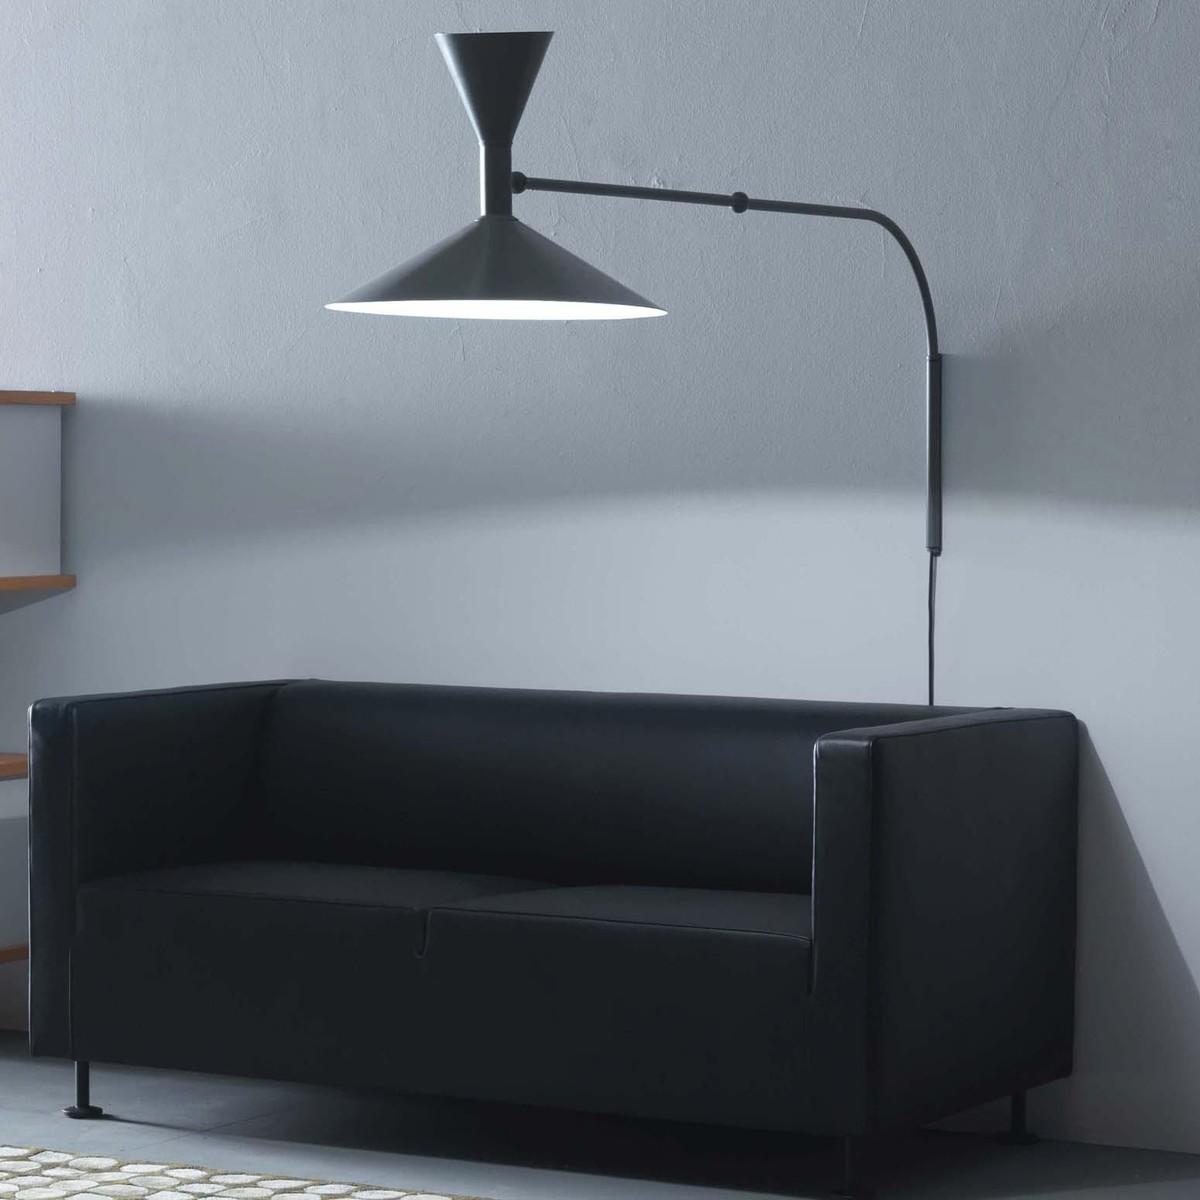 lampe de marseille applique murale nemo. Black Bedroom Furniture Sets. Home Design Ideas